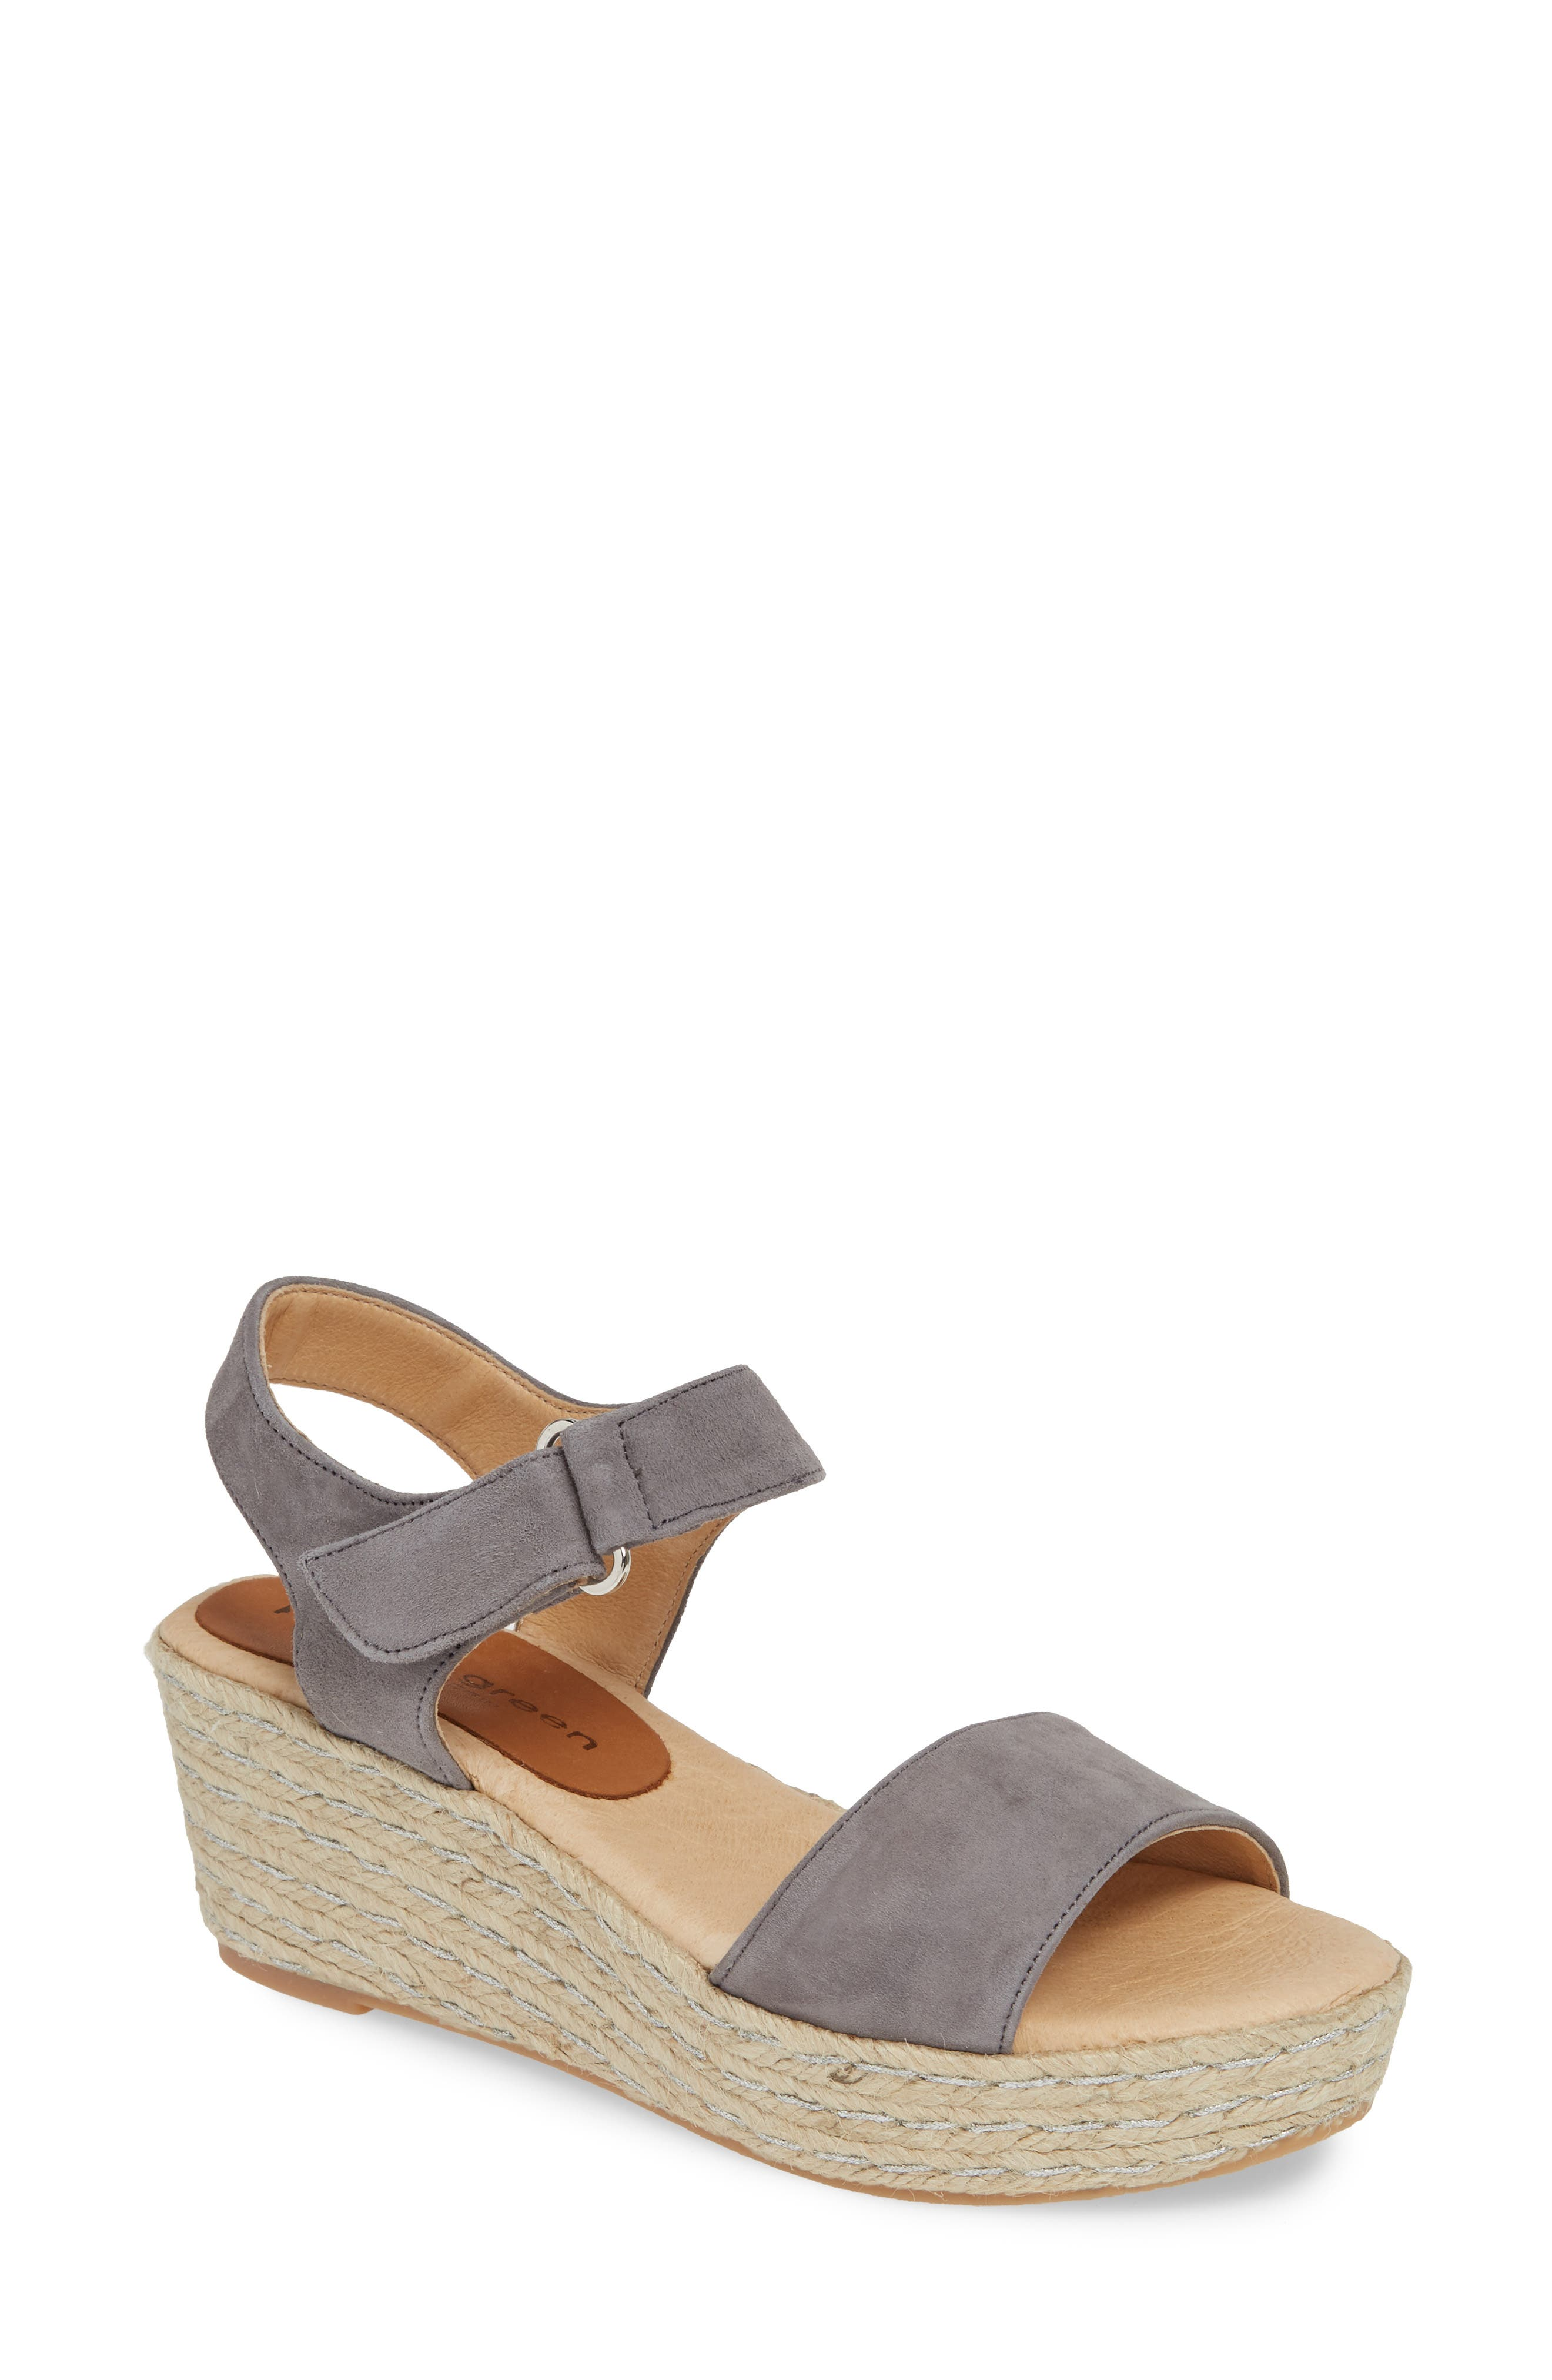 Patricia Green Corie Espadrille Wedge Sandal, Grey